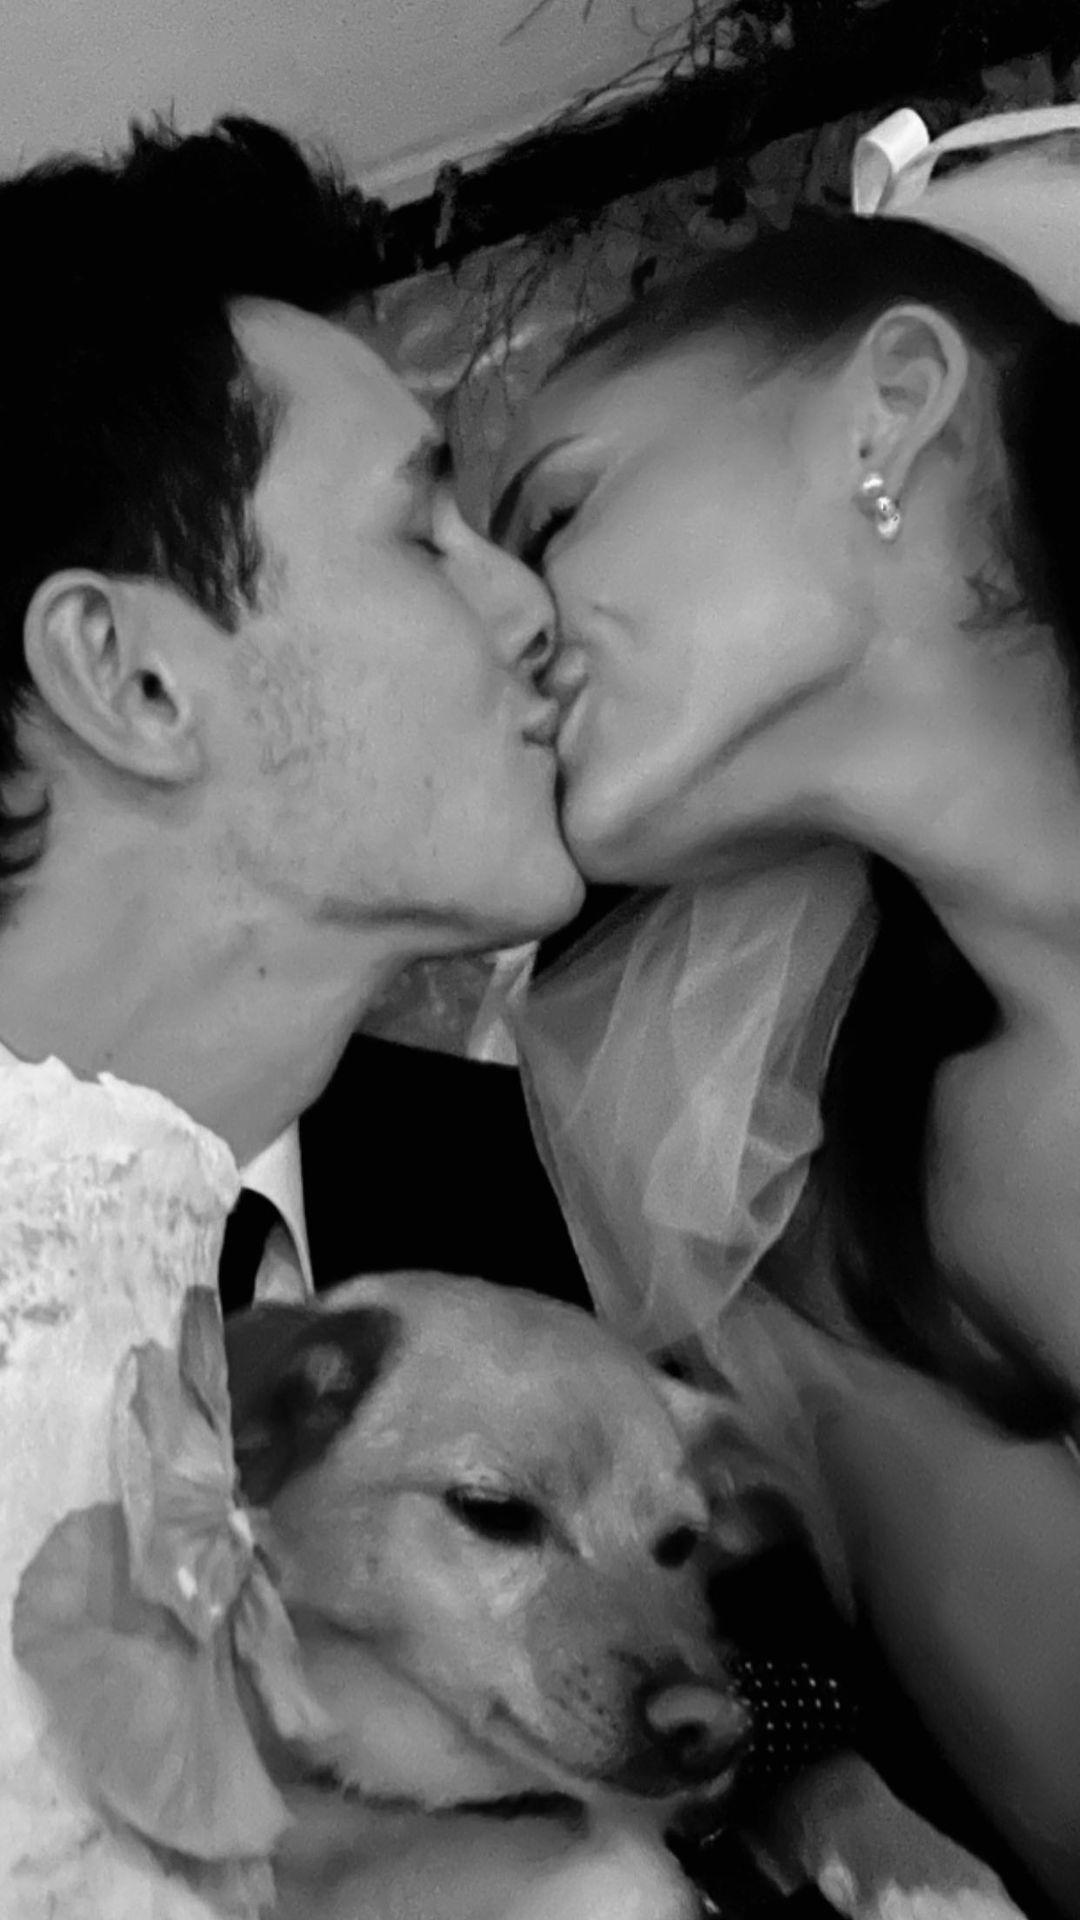 Ariana Grande Wishes Her New Husband A Happy Birthday!